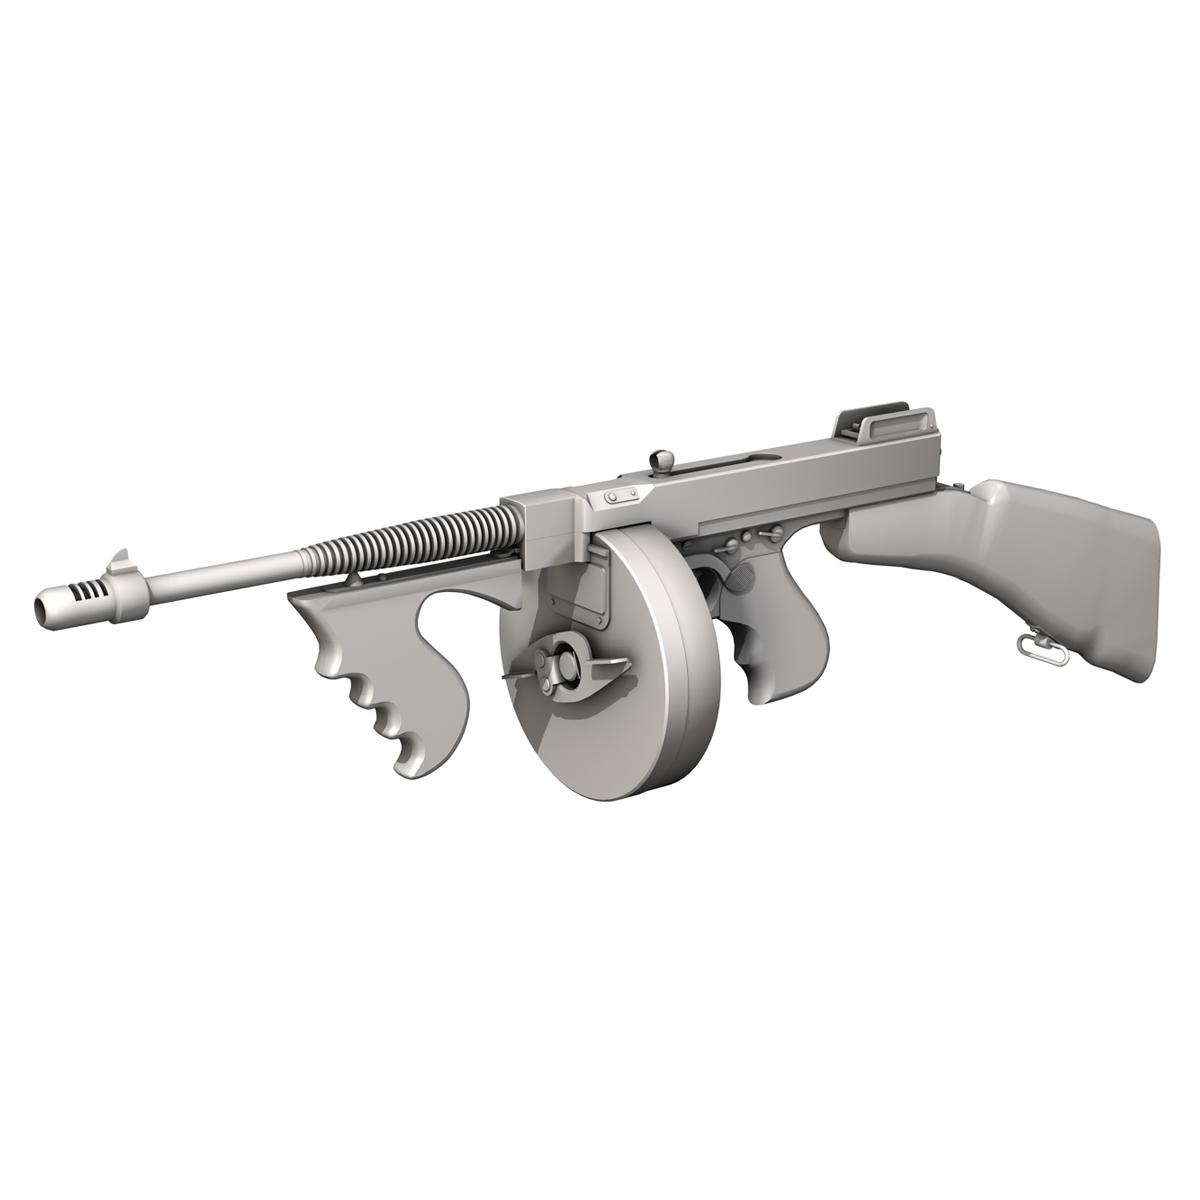 colt model1921 thompson submachine gun 3d model 3ds c4d lwo obj 264715